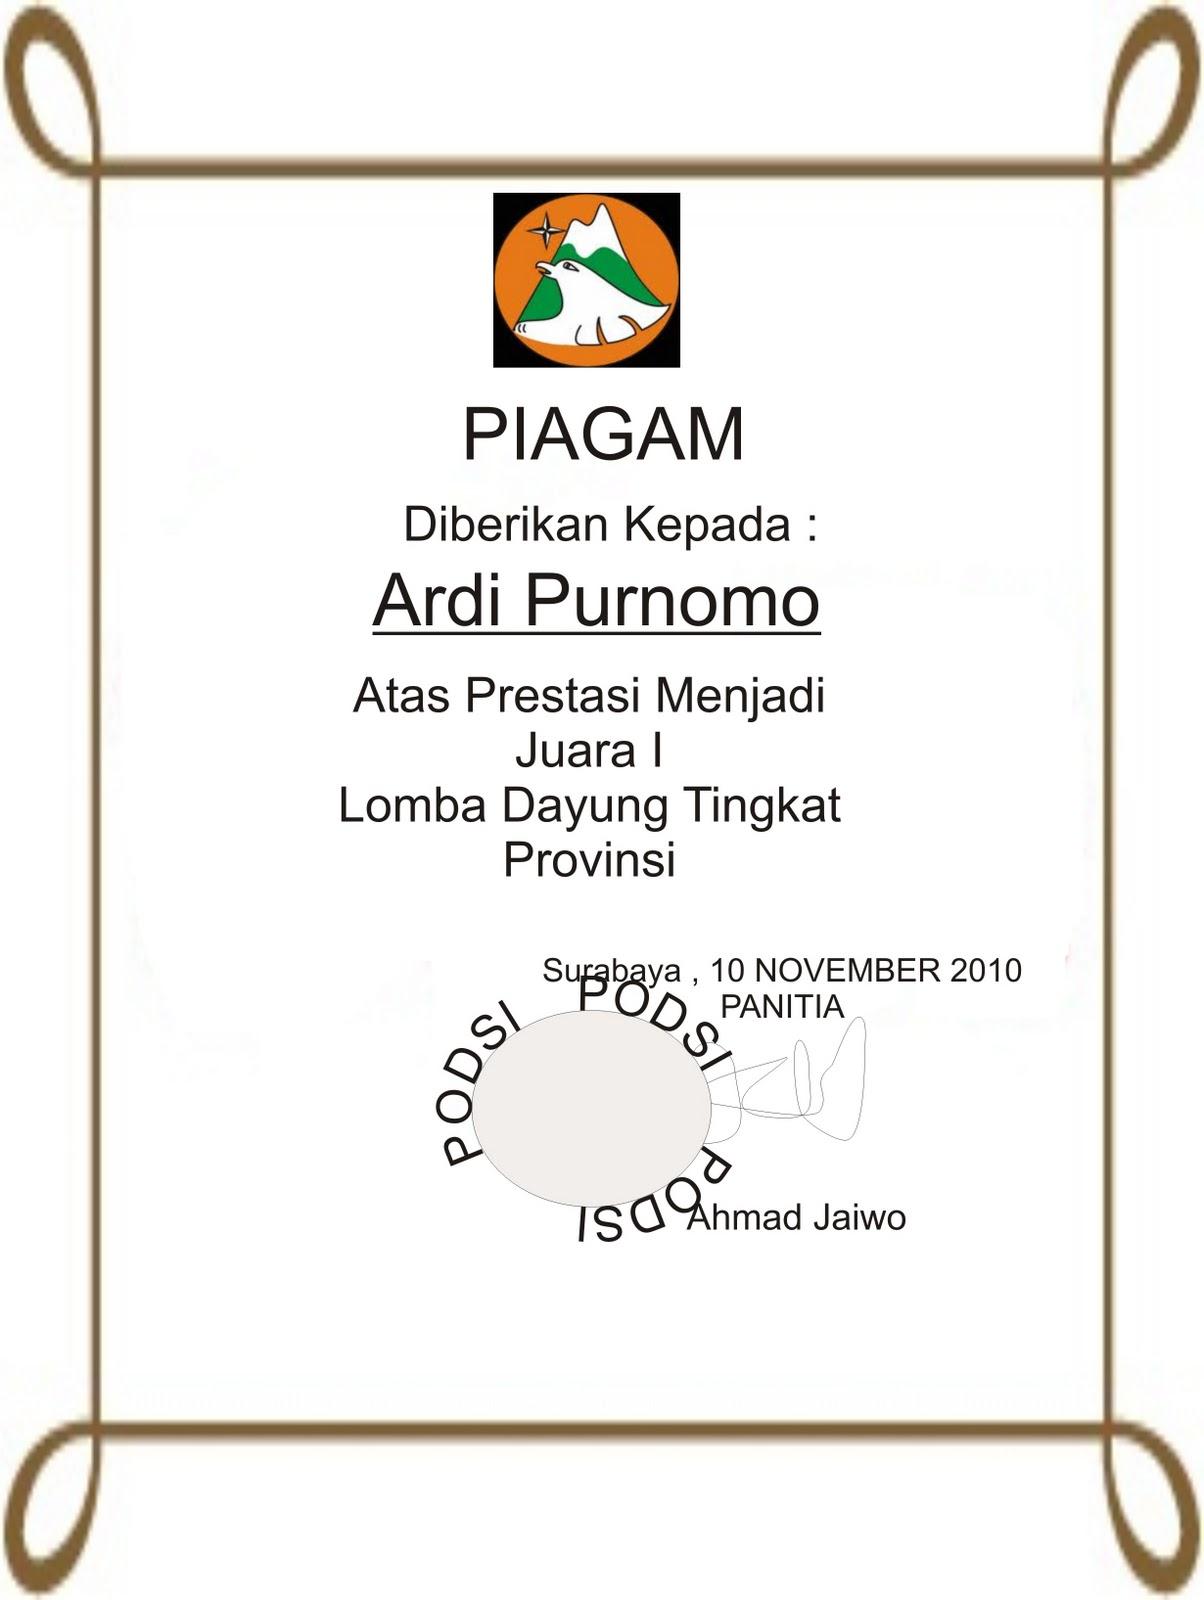 comment on this picture bingkai border frame ijazah sertifikat piagam